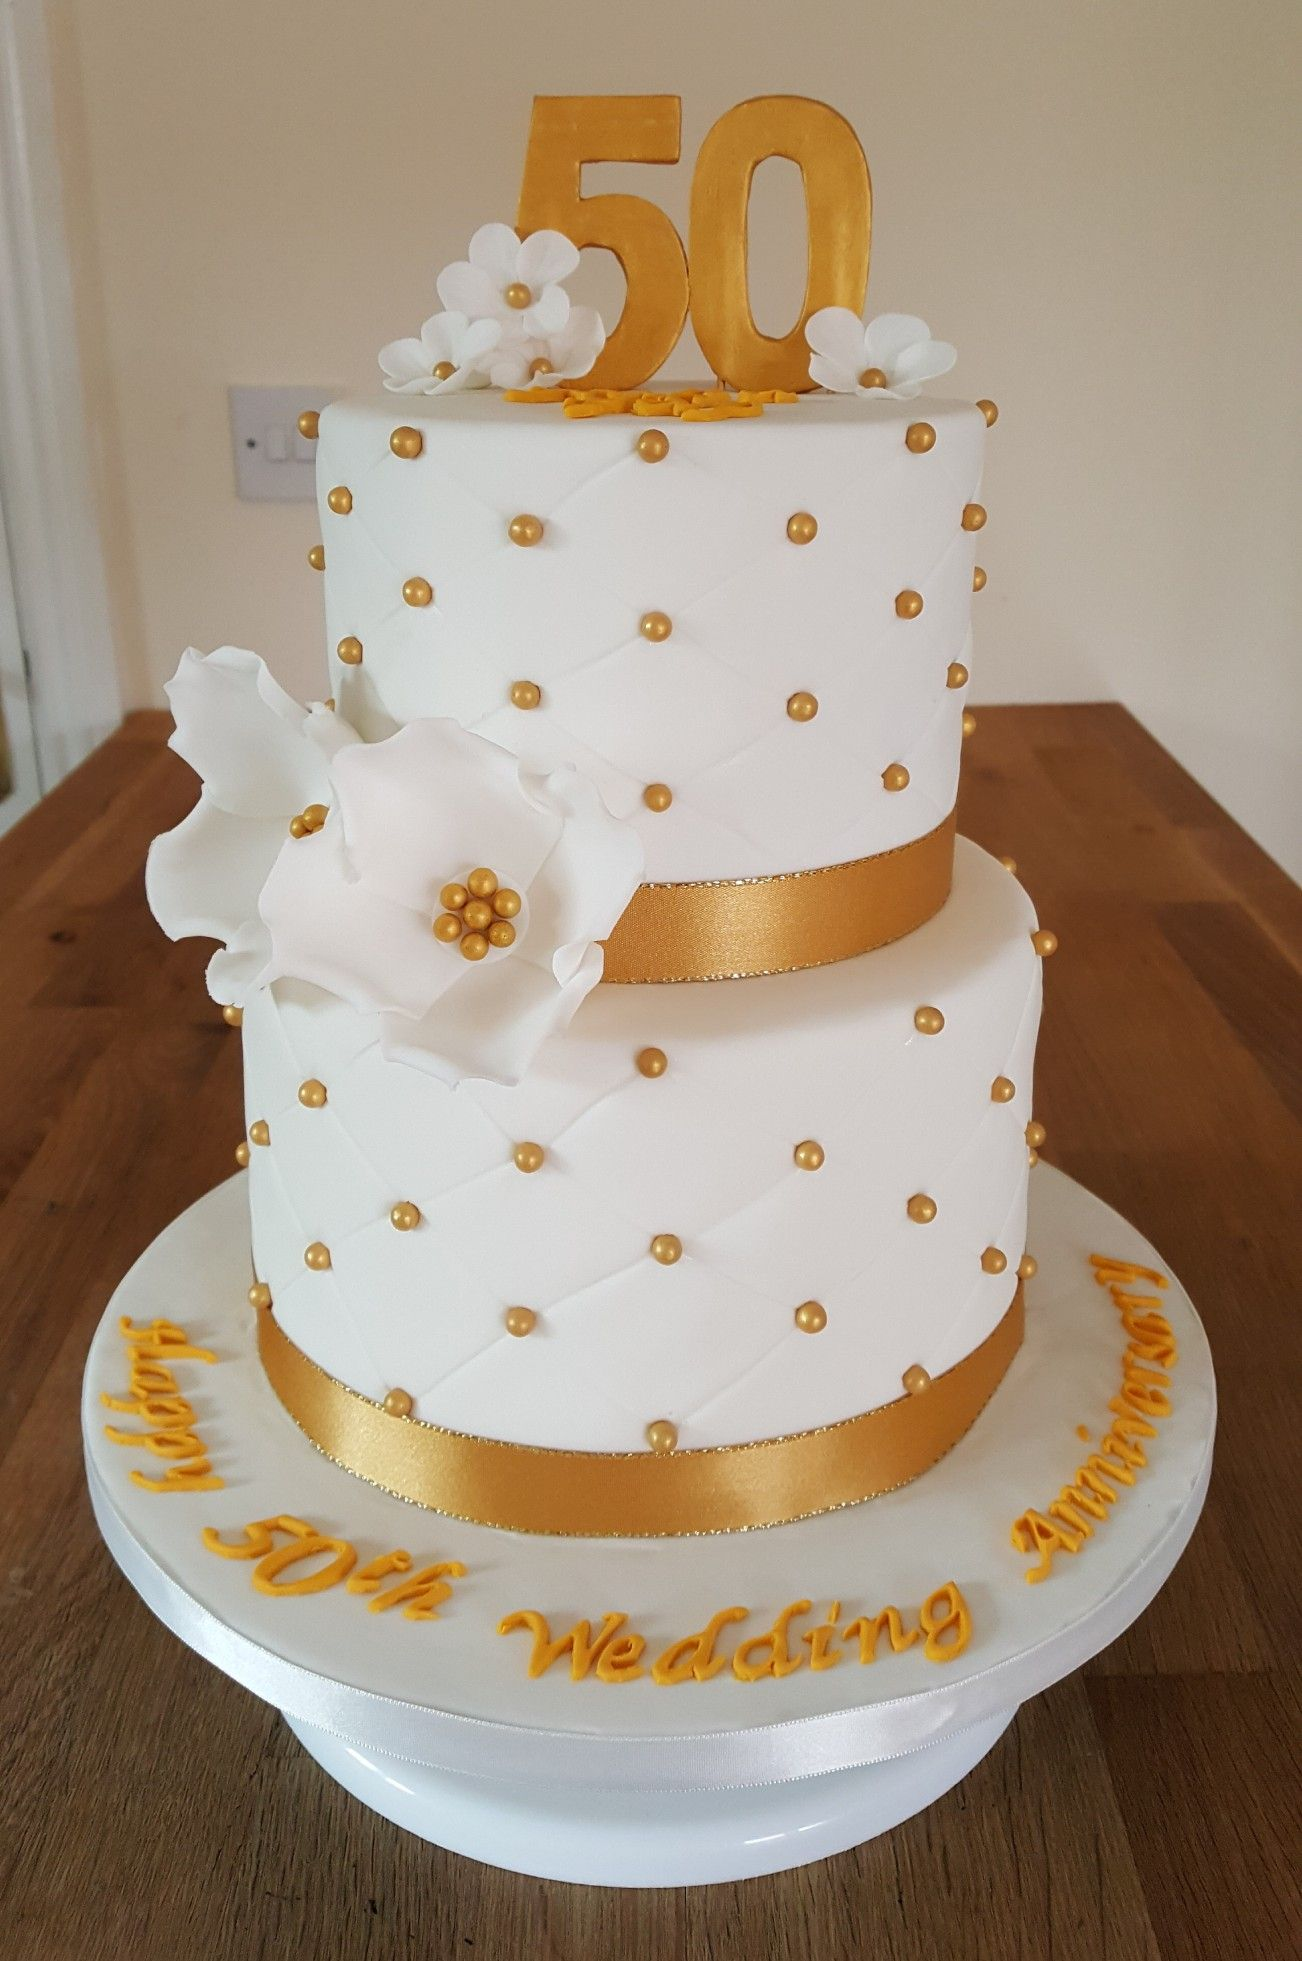 50th Golden Wedding Anniversary Cake | Alwynne\'s Homemade Cakes ...